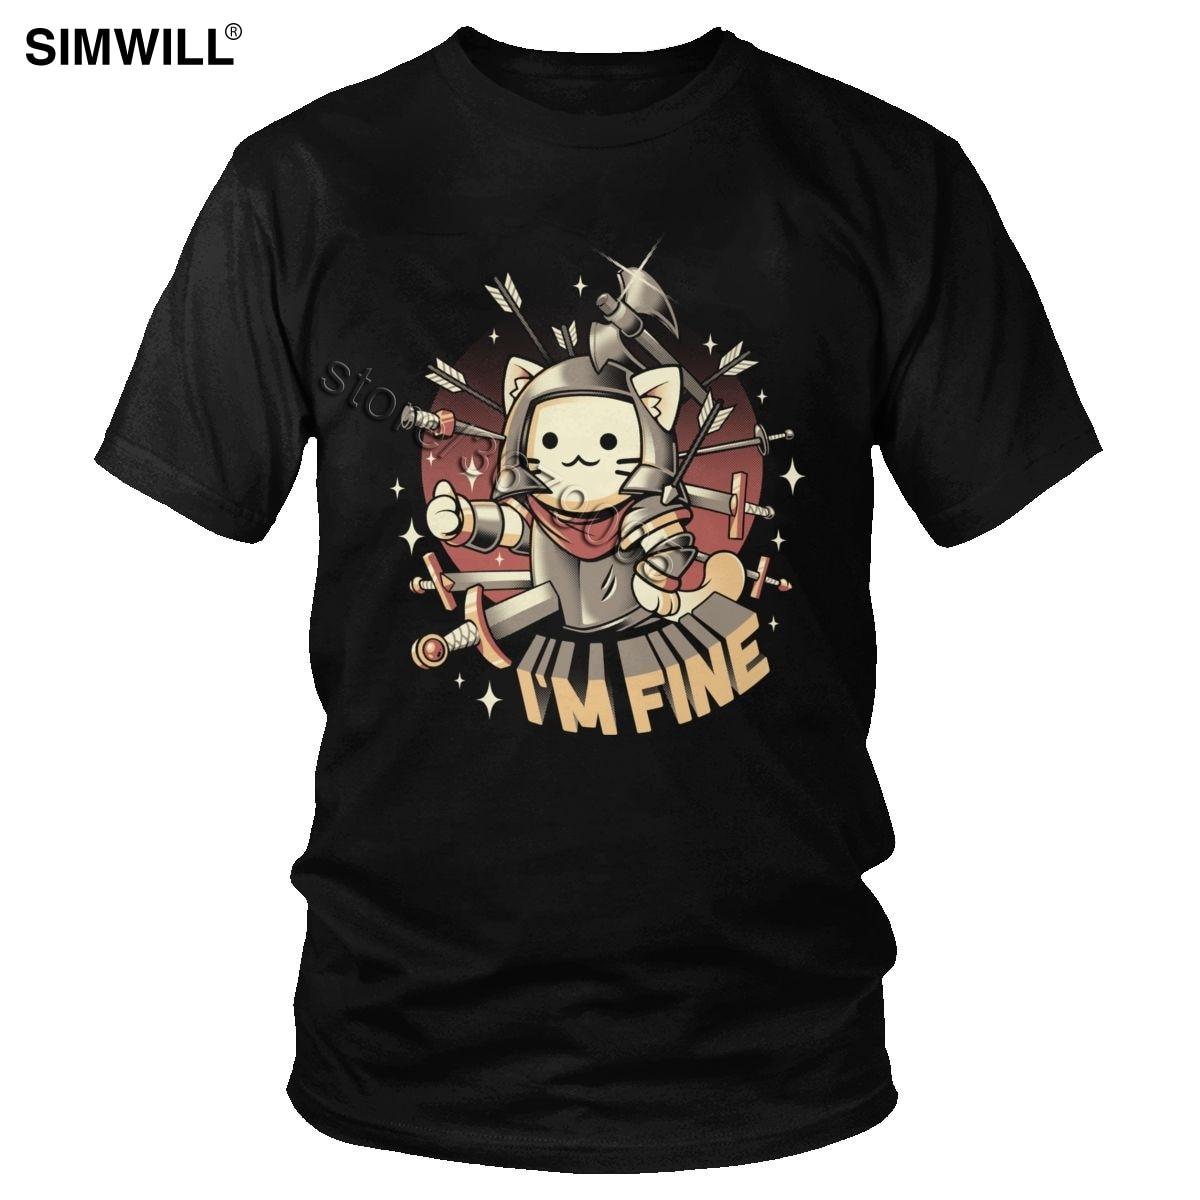 I/'M Fine Poor Girl Crying Feel Bad TUMBLR Fashion T Shirt Men Women Unisex 1392